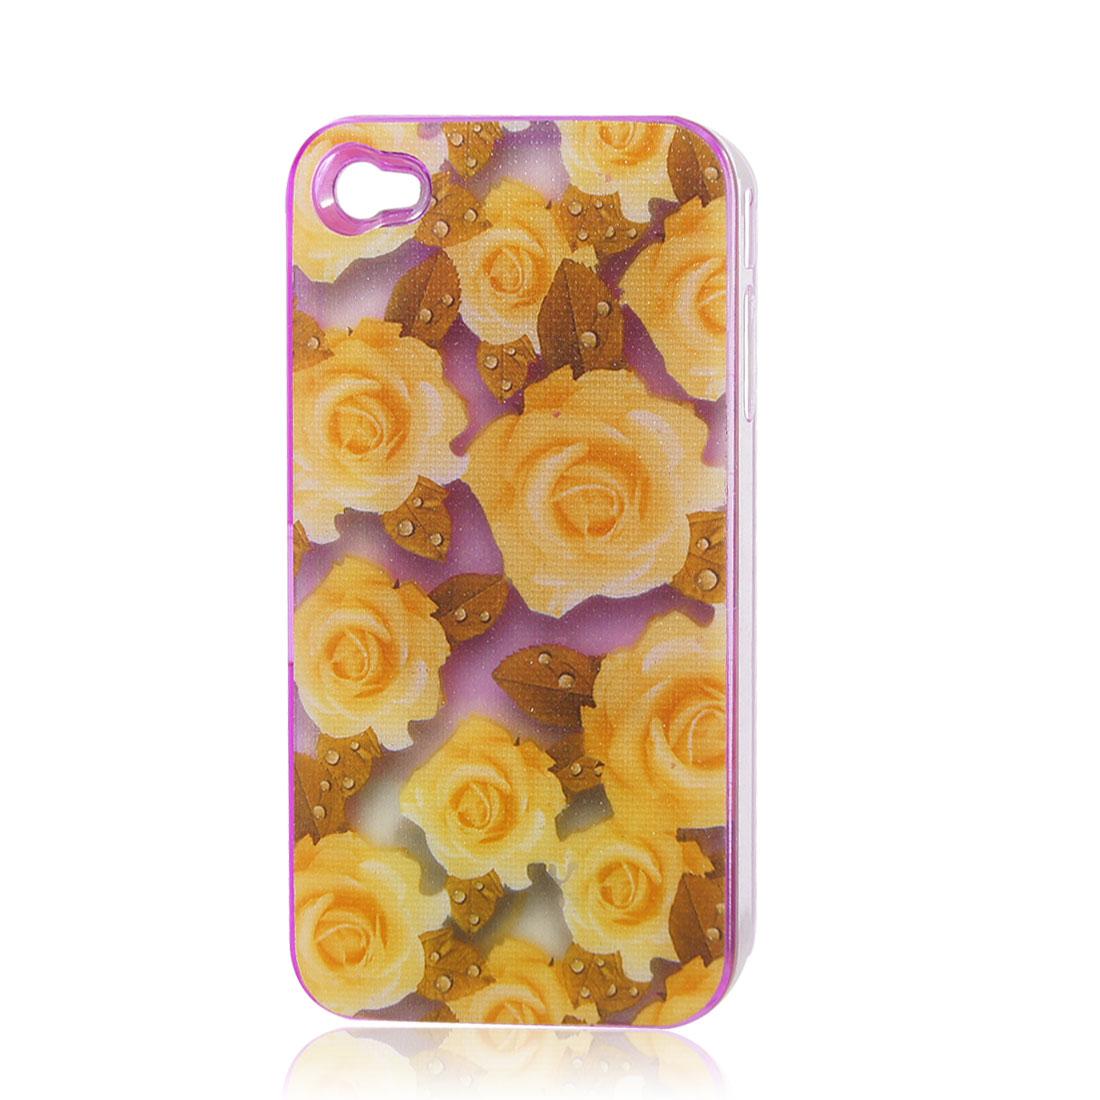 Pale Orange Roses Sense Flash Light LED Color Changed Hard Back Case Cover for iPhone 4 4S